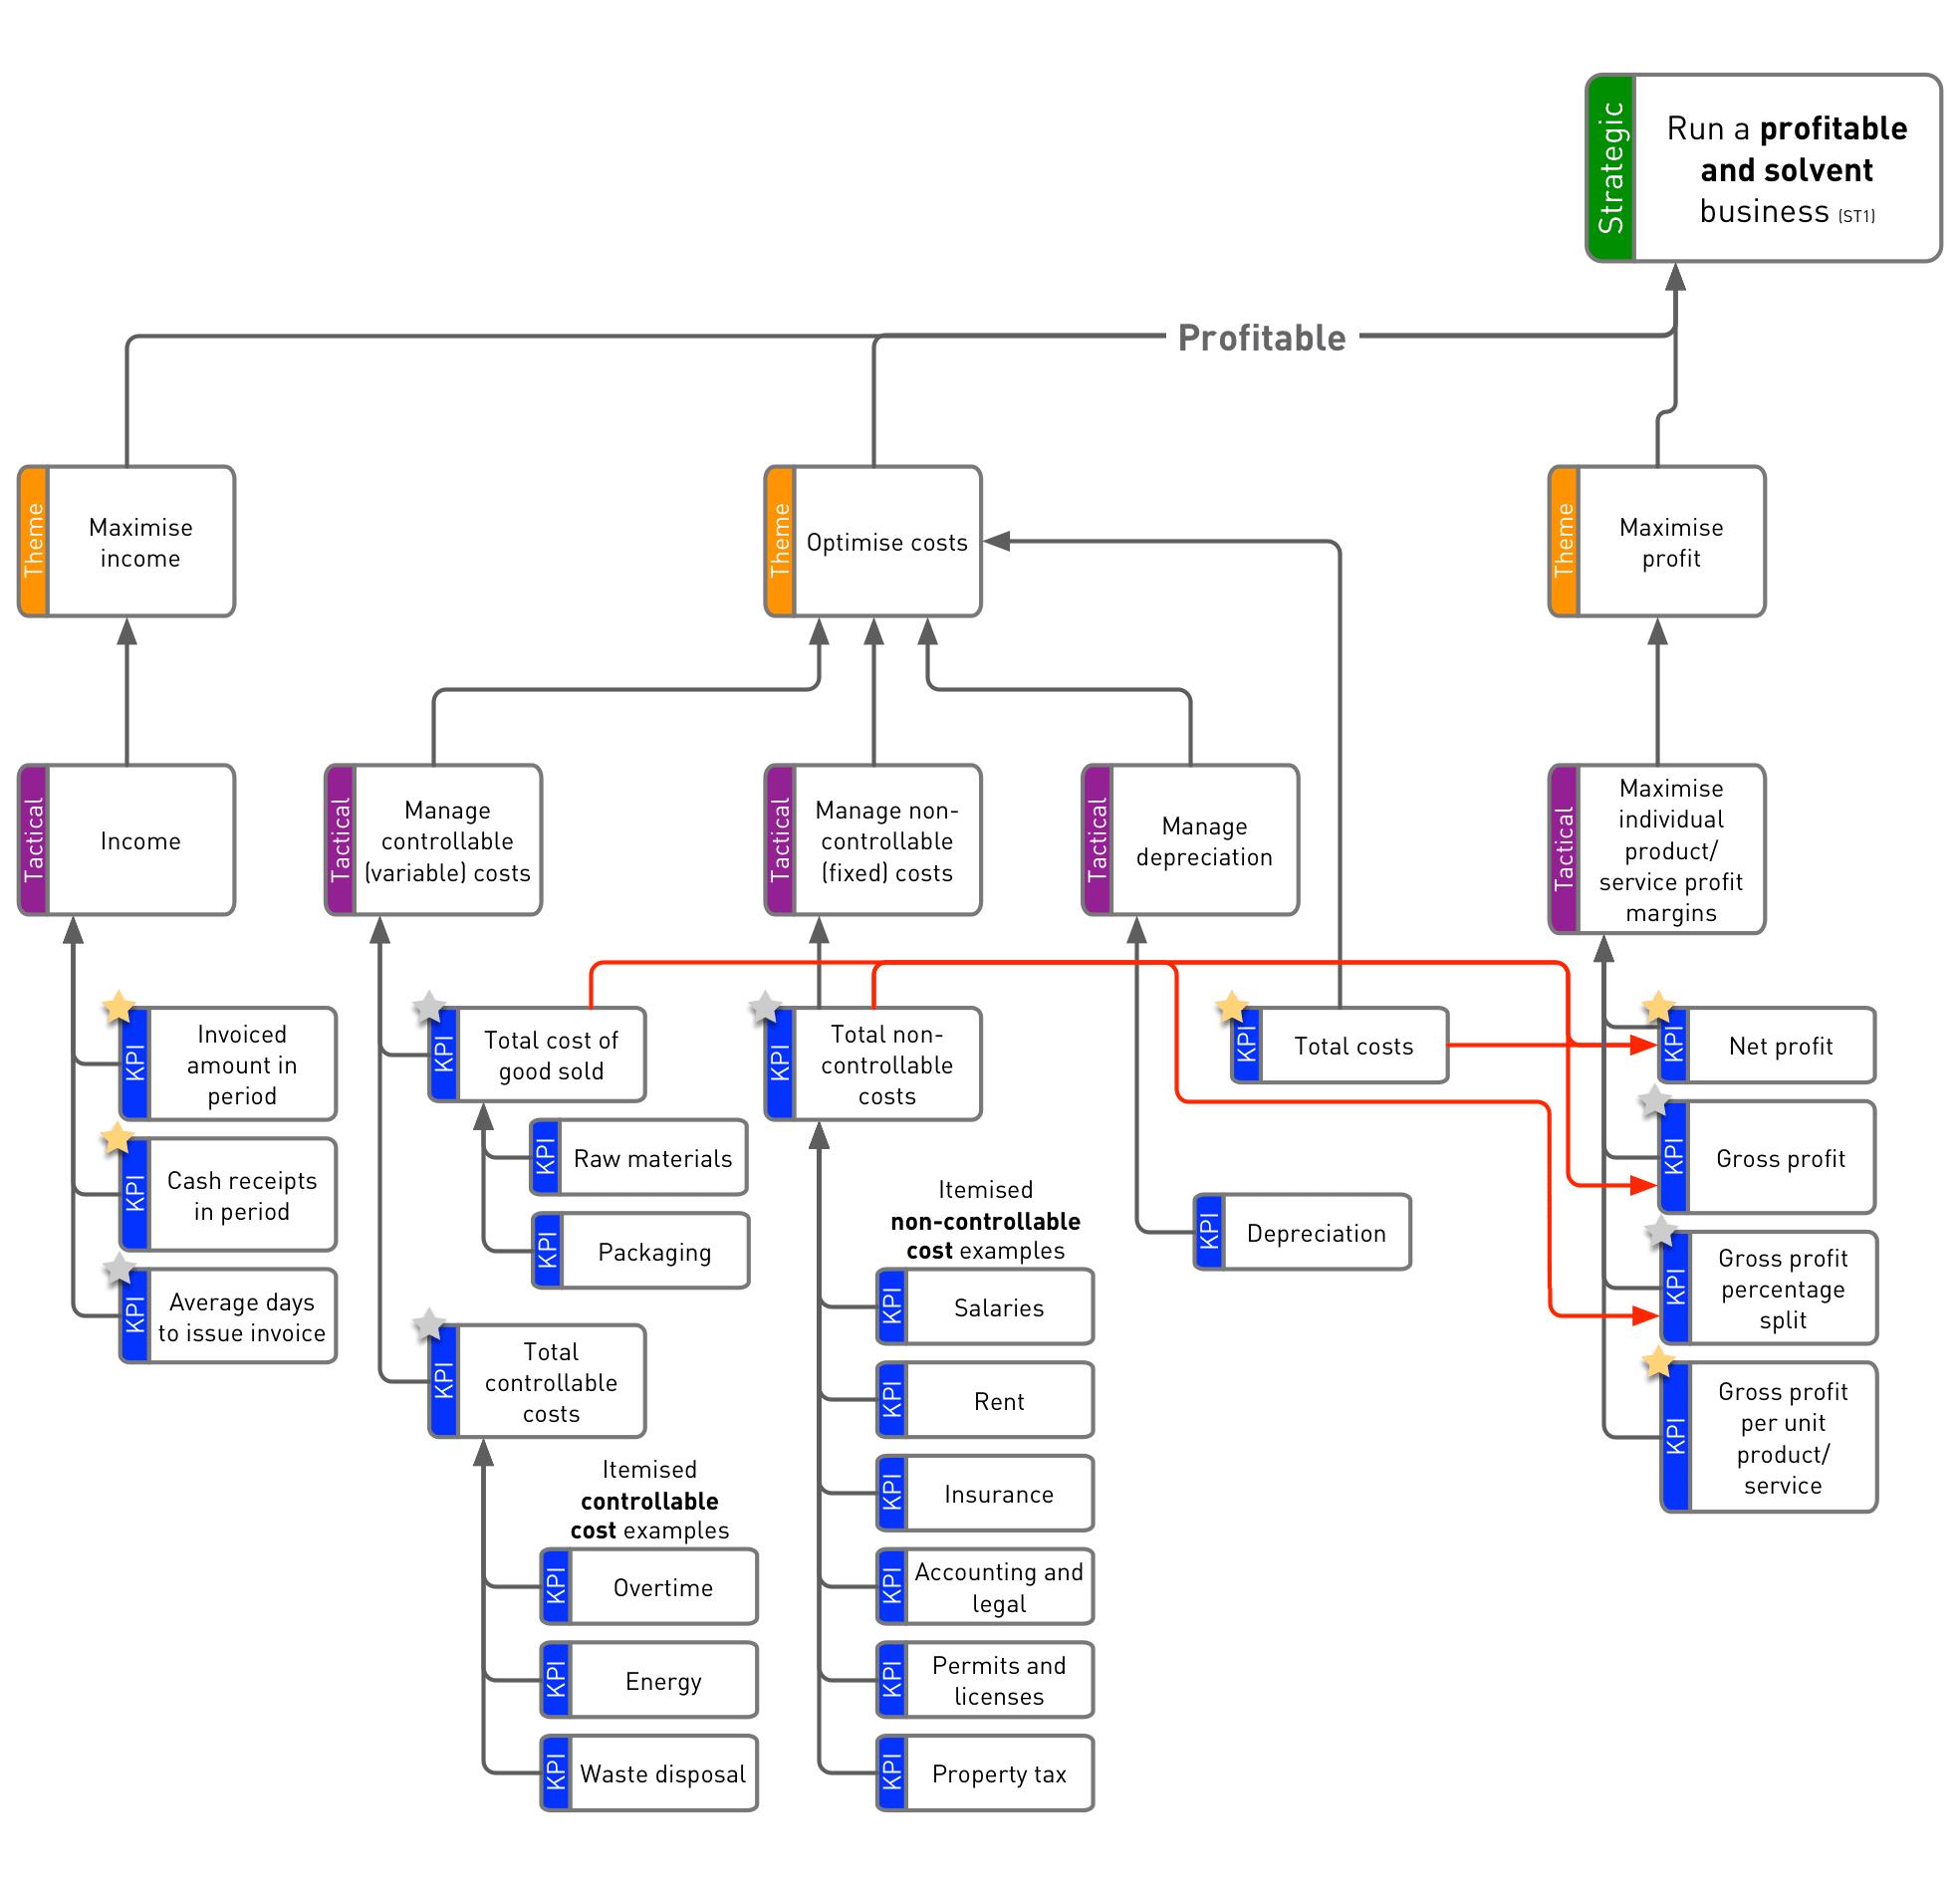 Financial KPI Tree - Profit branches - v2